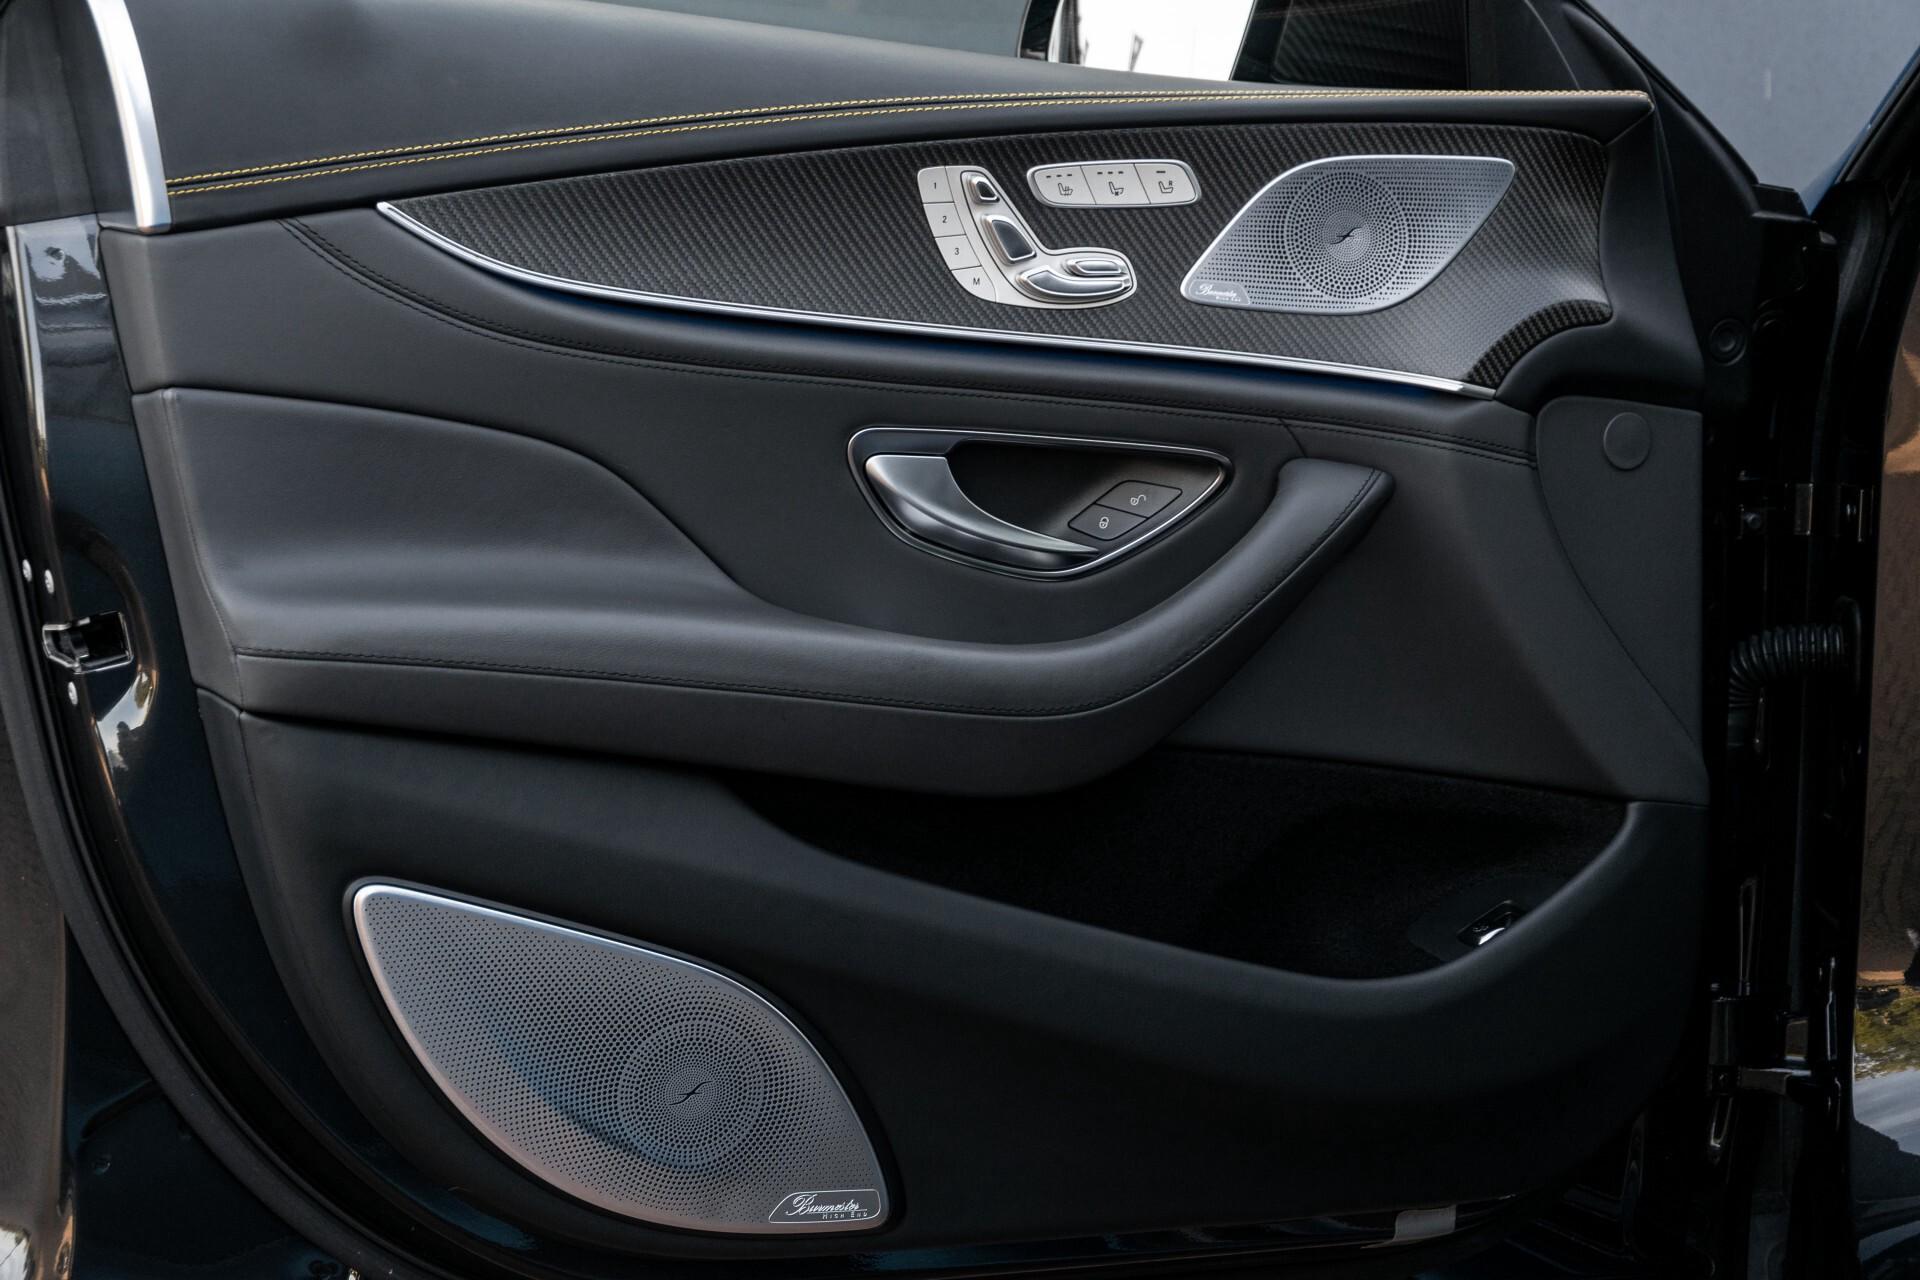 Mercedes-Benz AMG GT 4-Door Coupe 63 S 4MATIC+ Edition 1 Keramisch/Carbon/First Class/Dynamic Plus/Burmester High End 3D Aut9 Foto 18